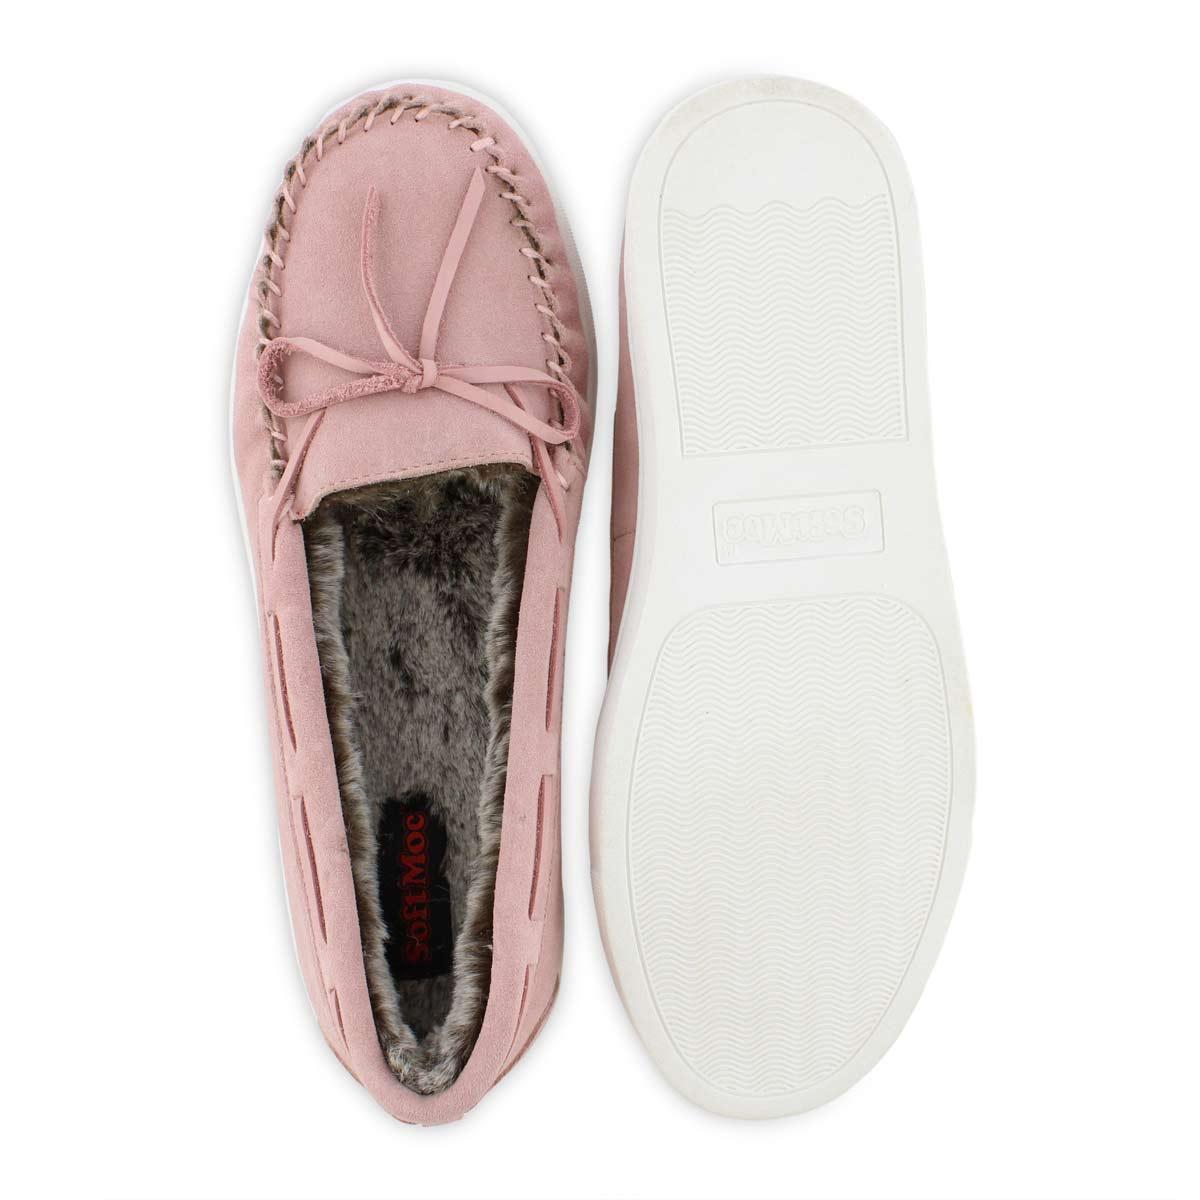 Lds Saginaw pink ballerina moc